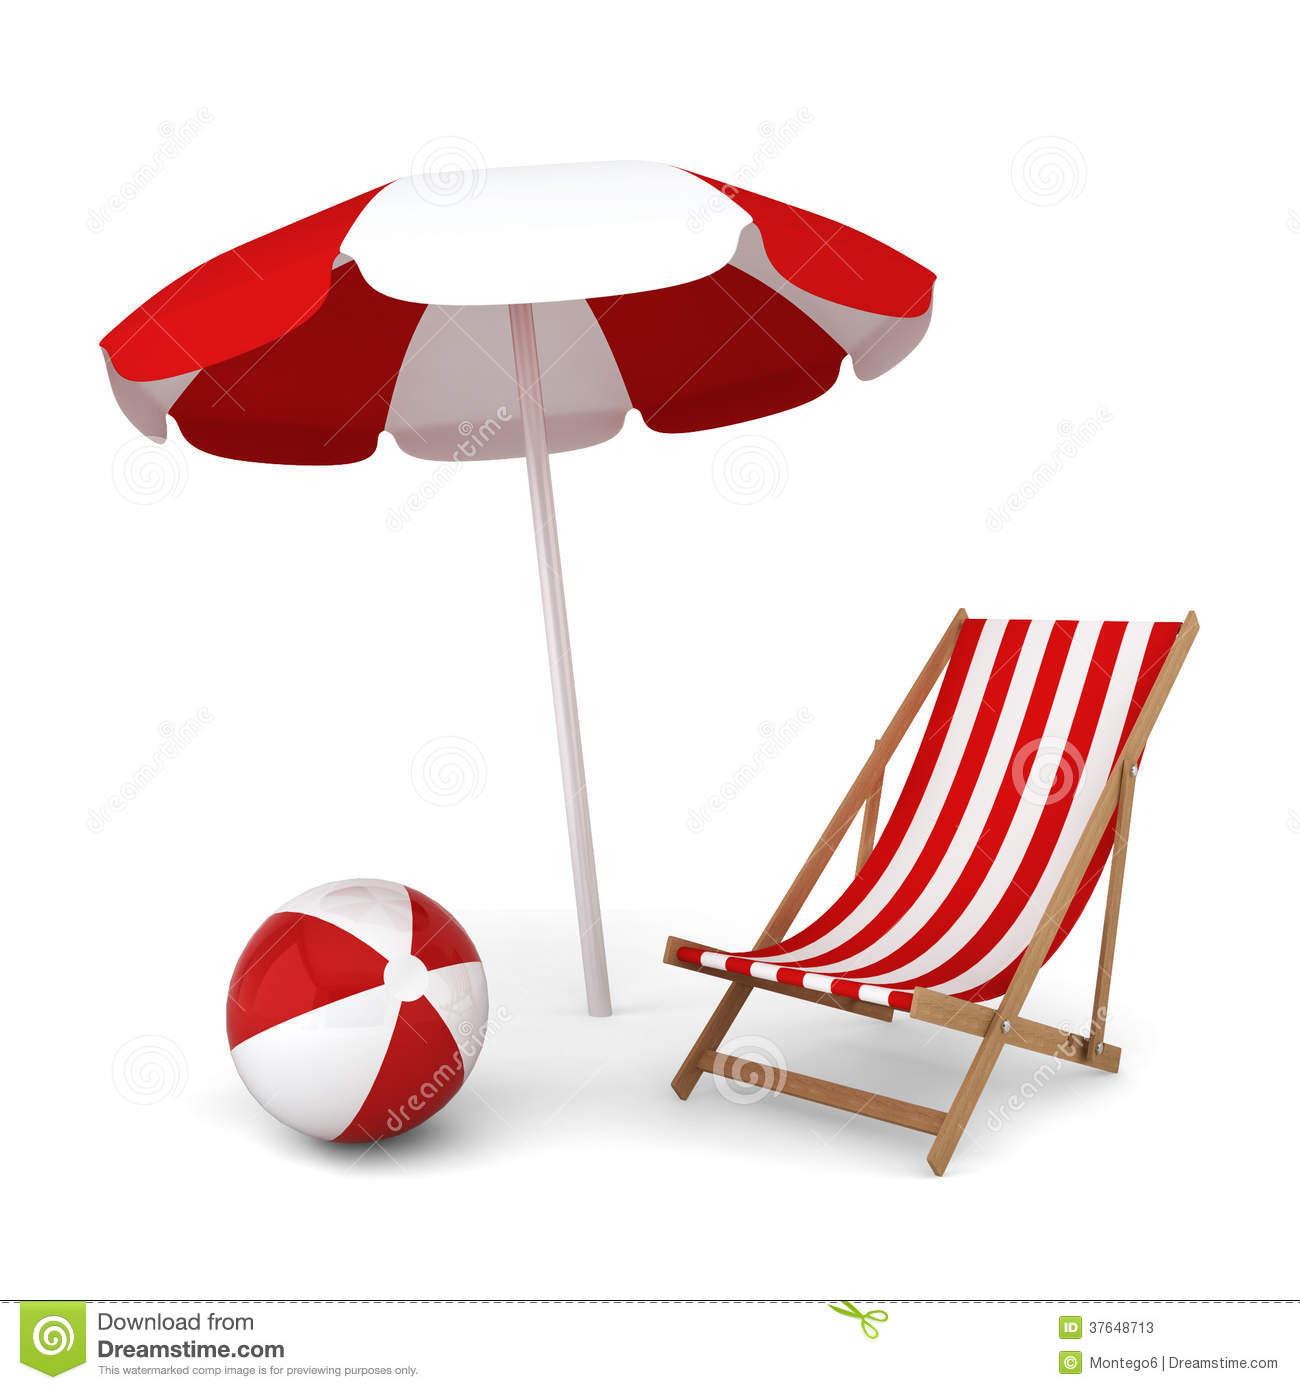 Beachball clipart sun umbrella. Chic free stock photo